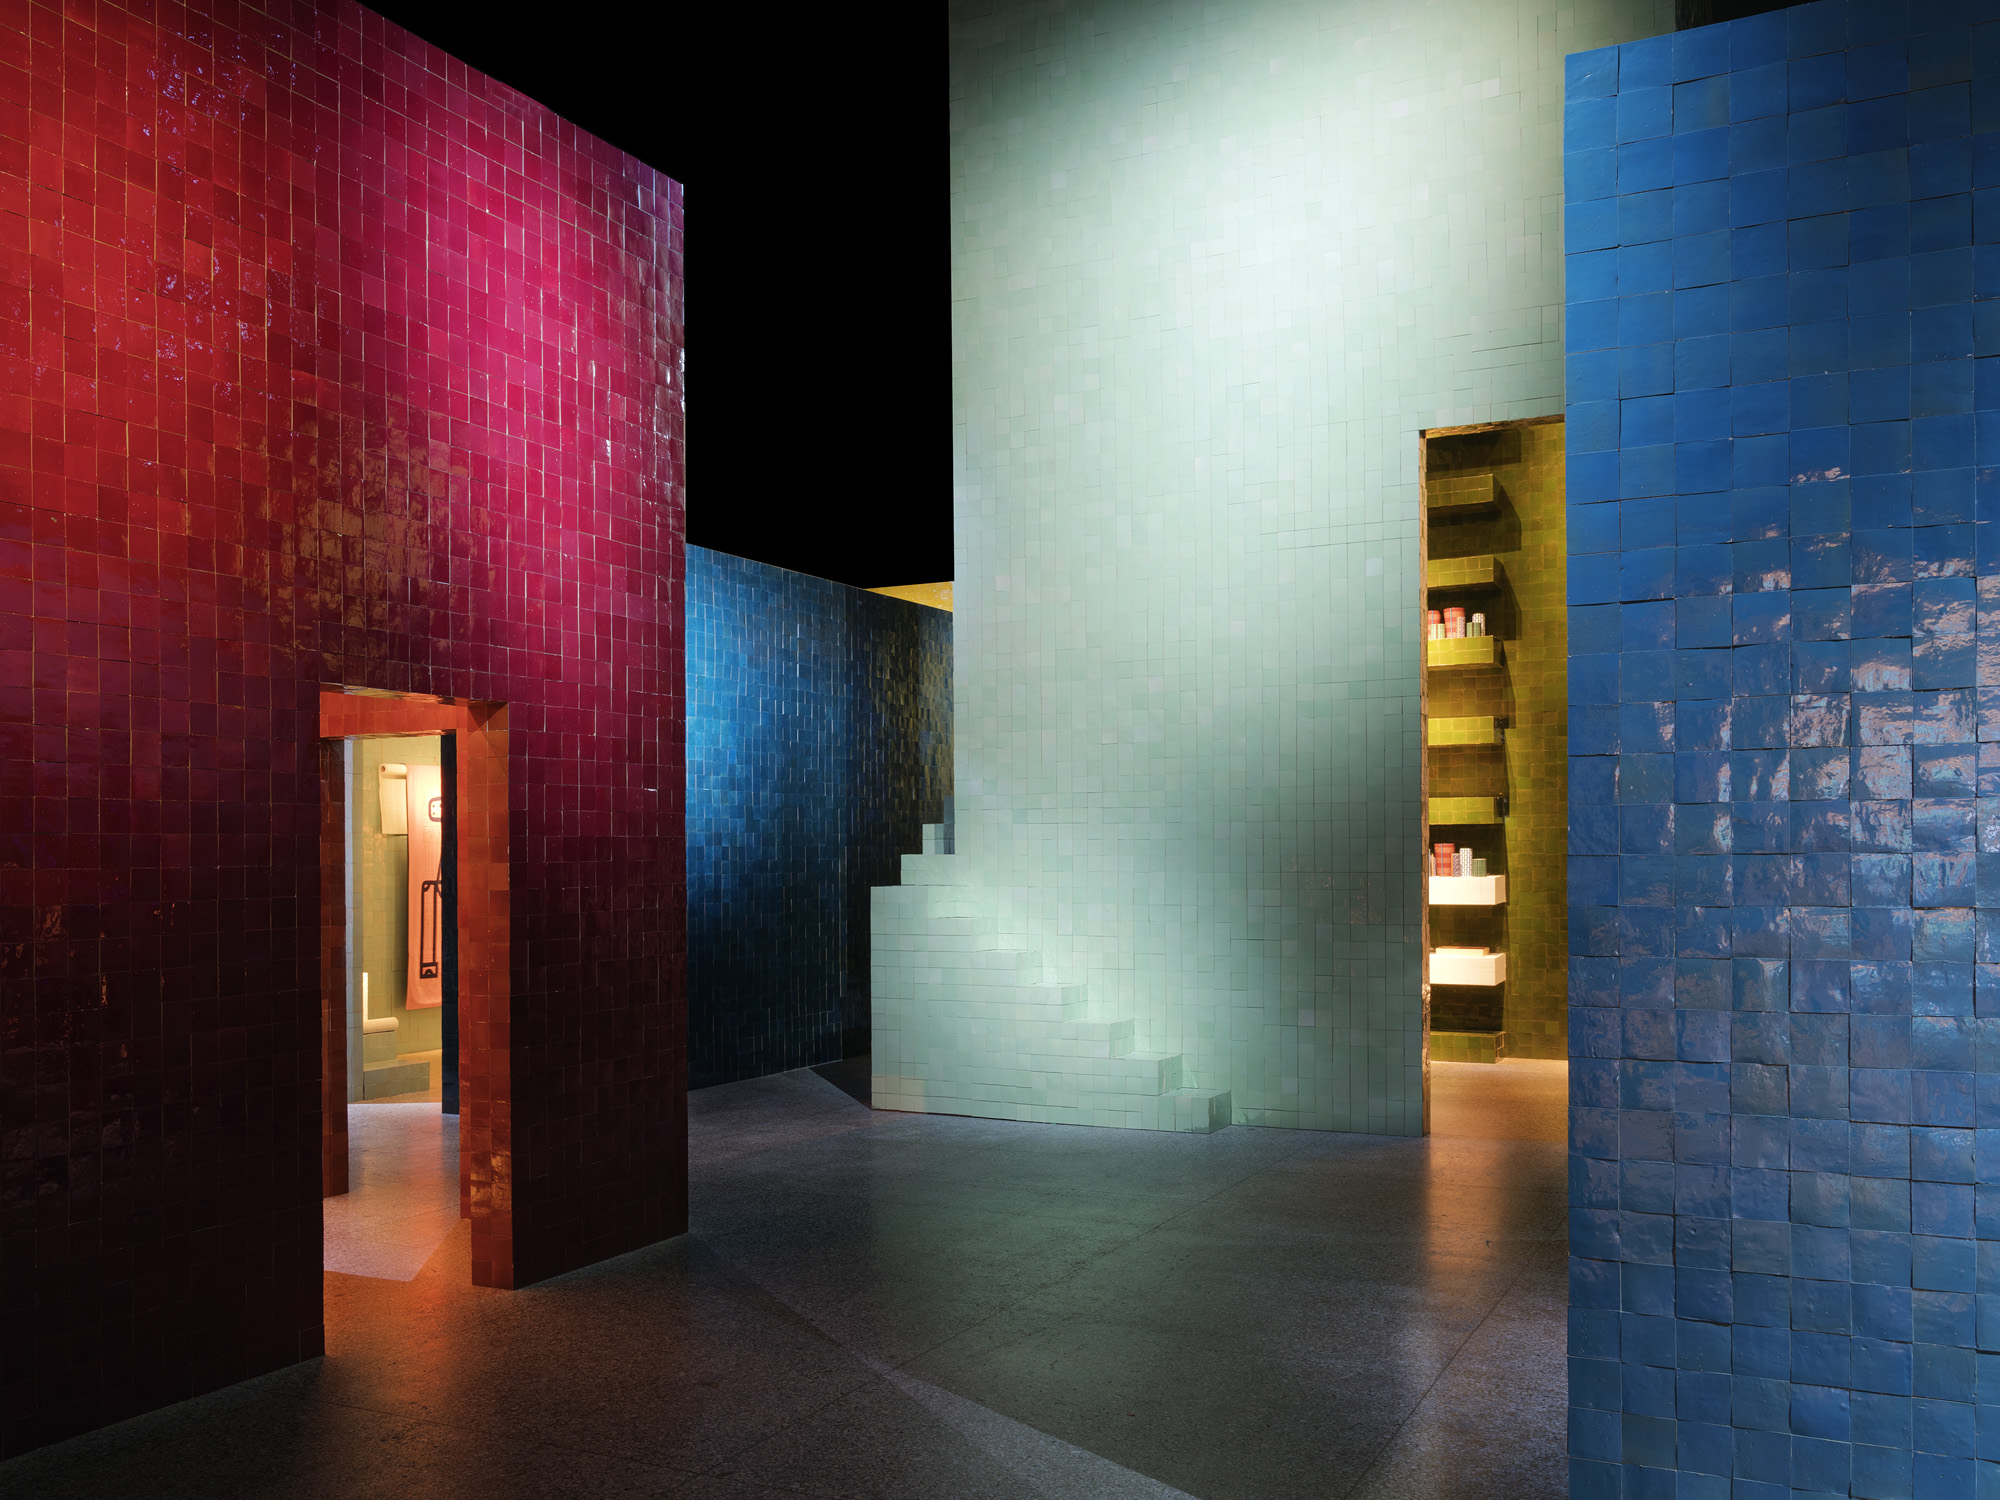 pavillon-hermes-2018-image11